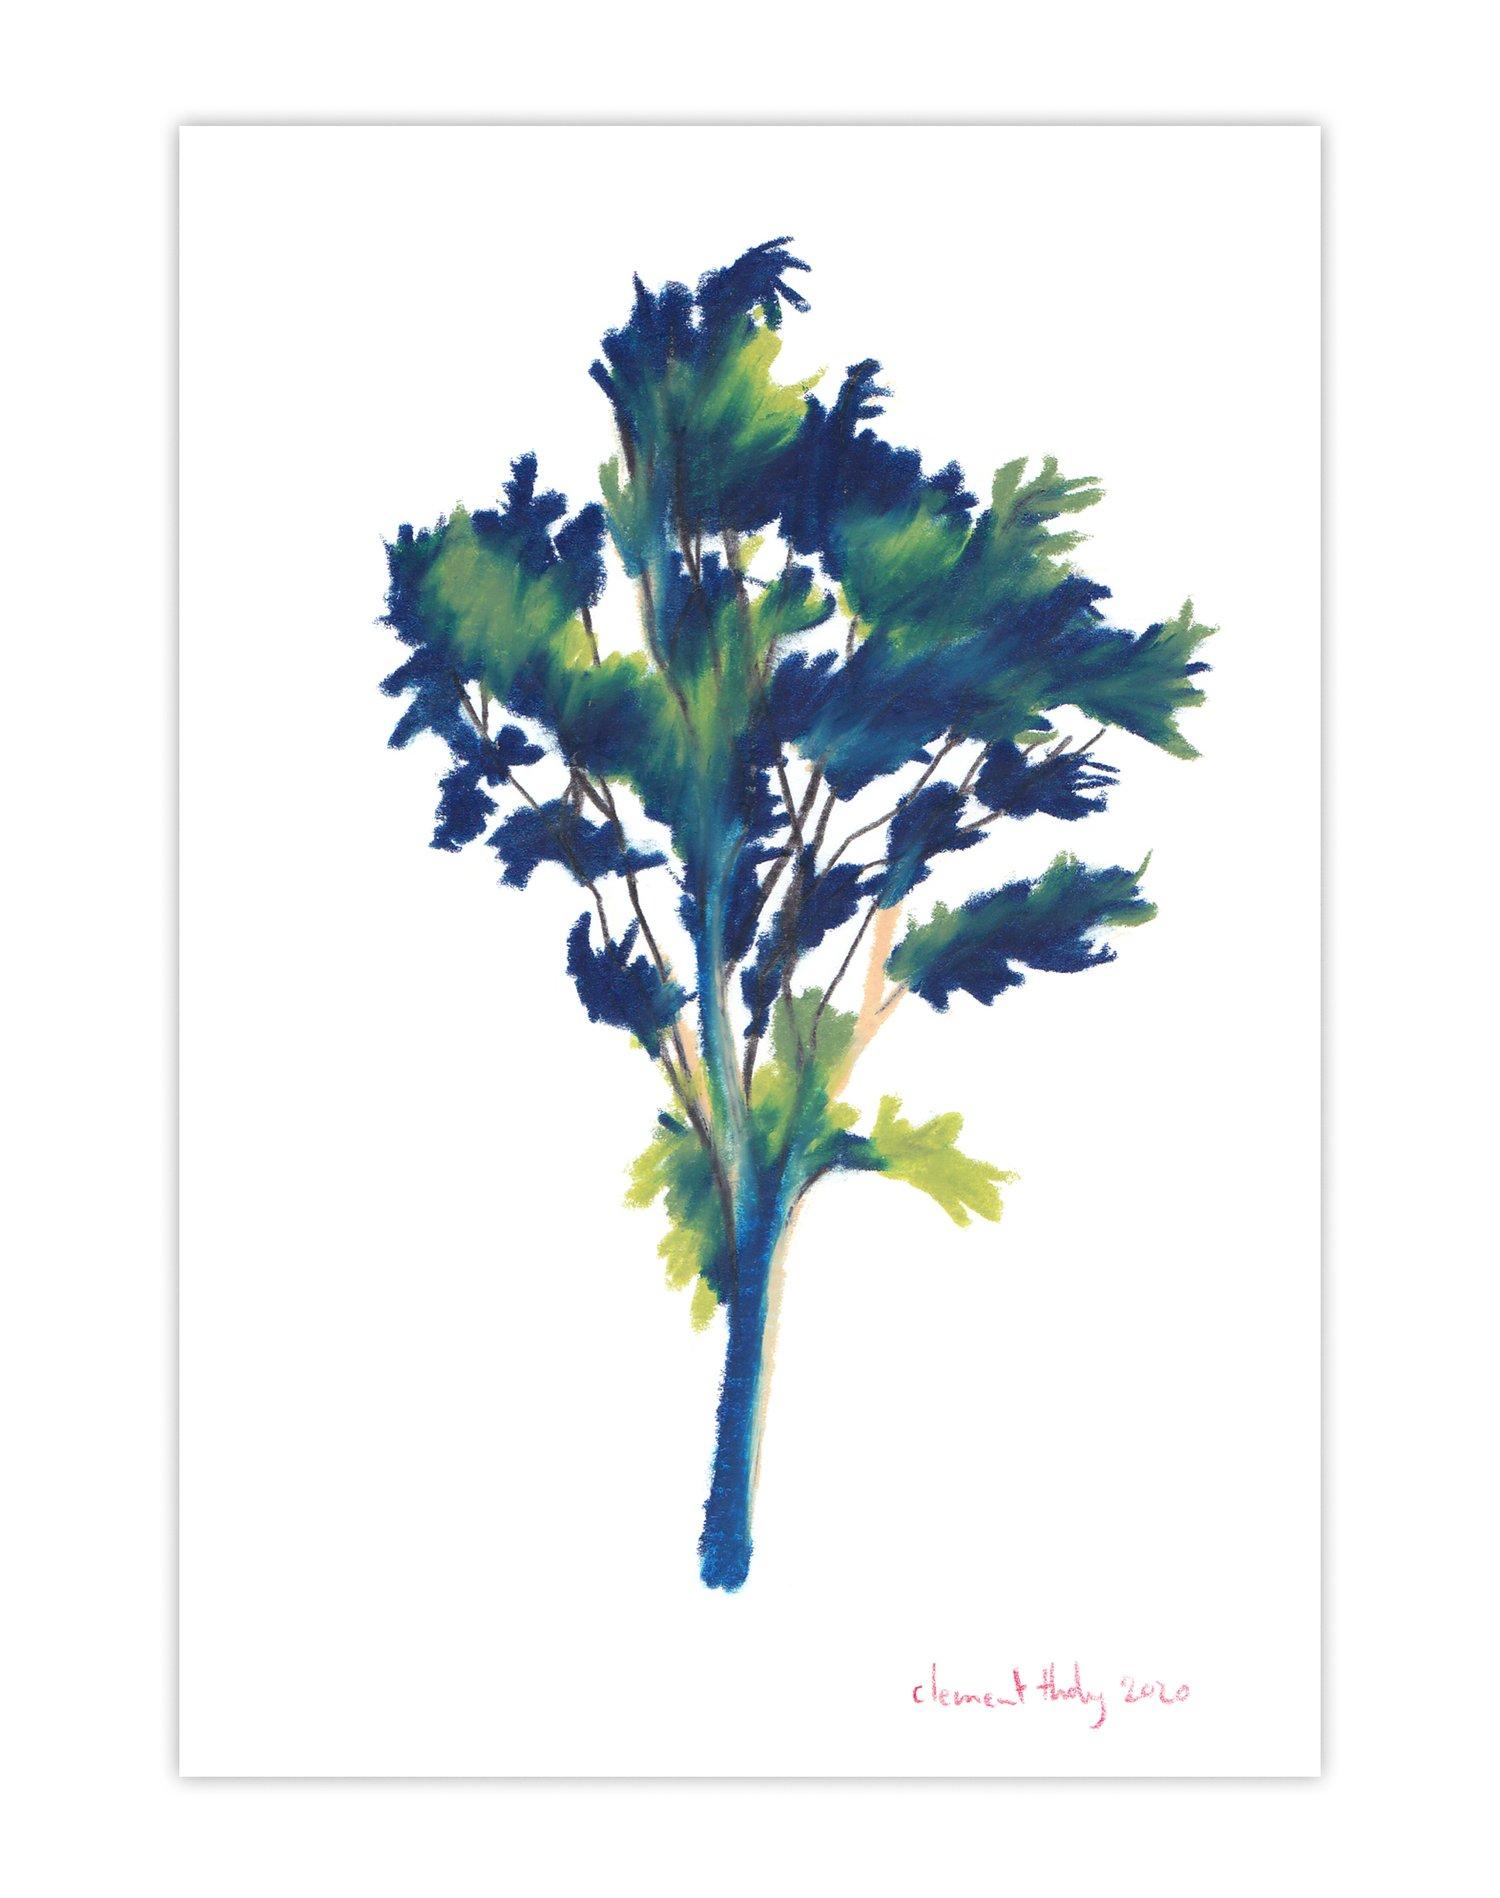 Image of Tree #421